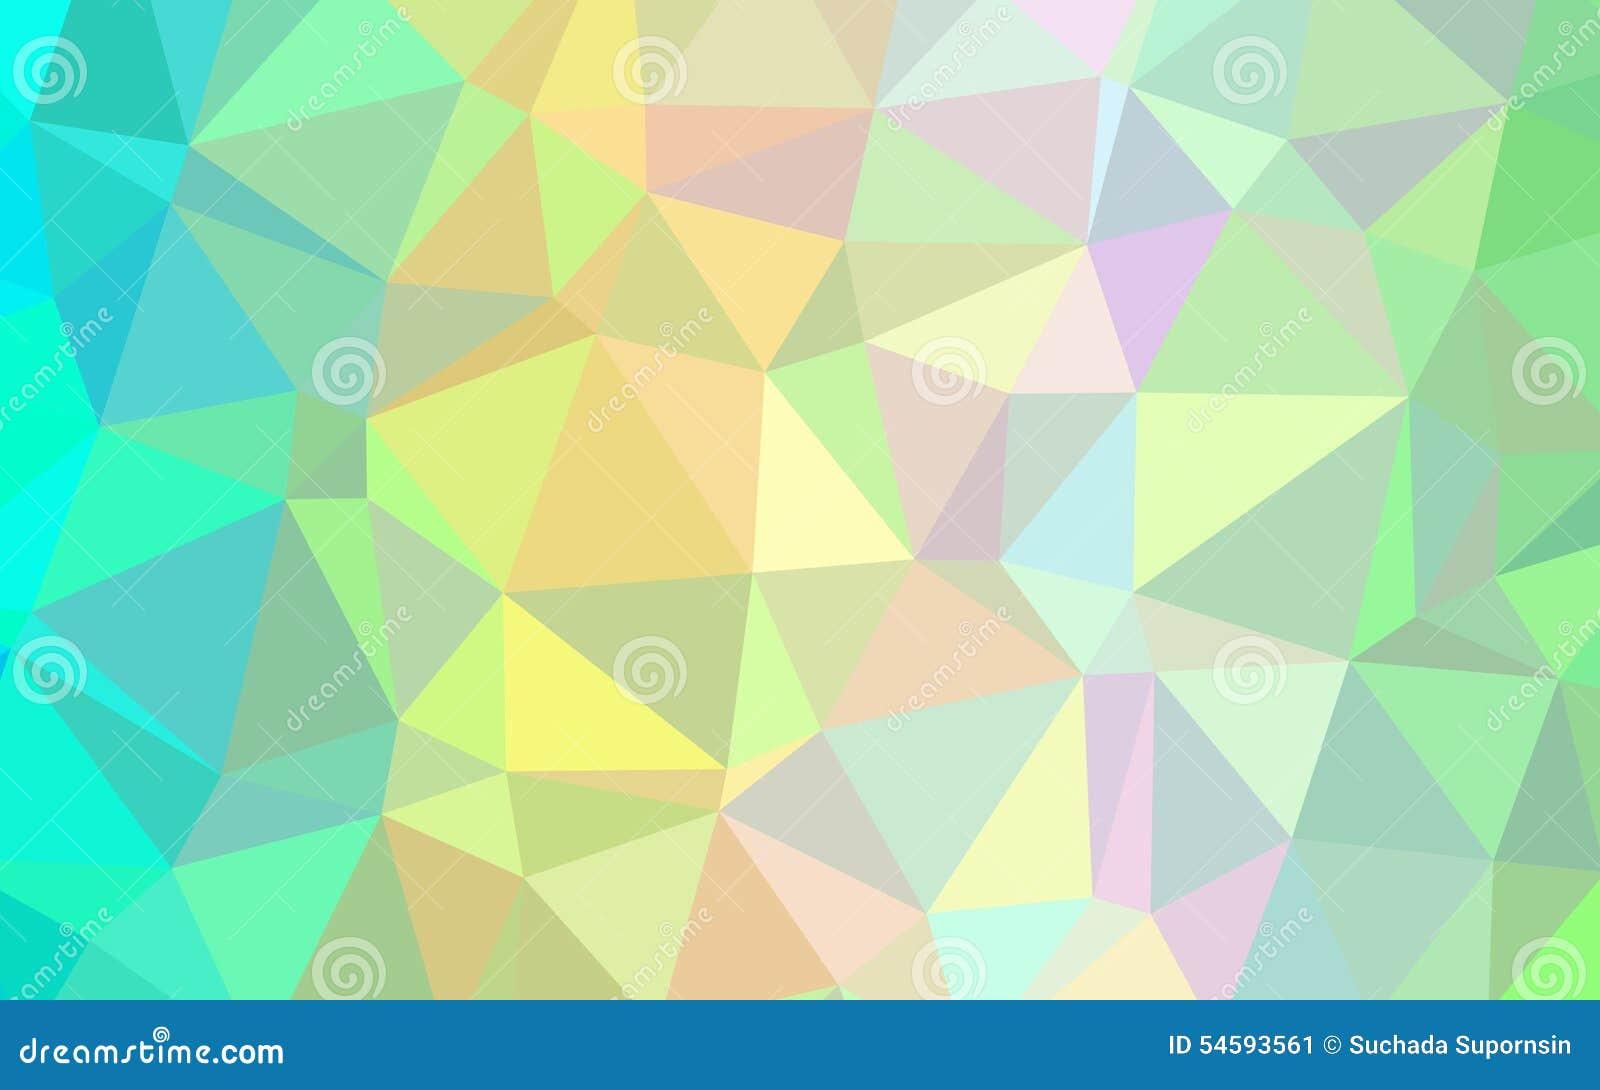 Abstract polygon wallpaper stock image. Image of wallpaper - 54593561